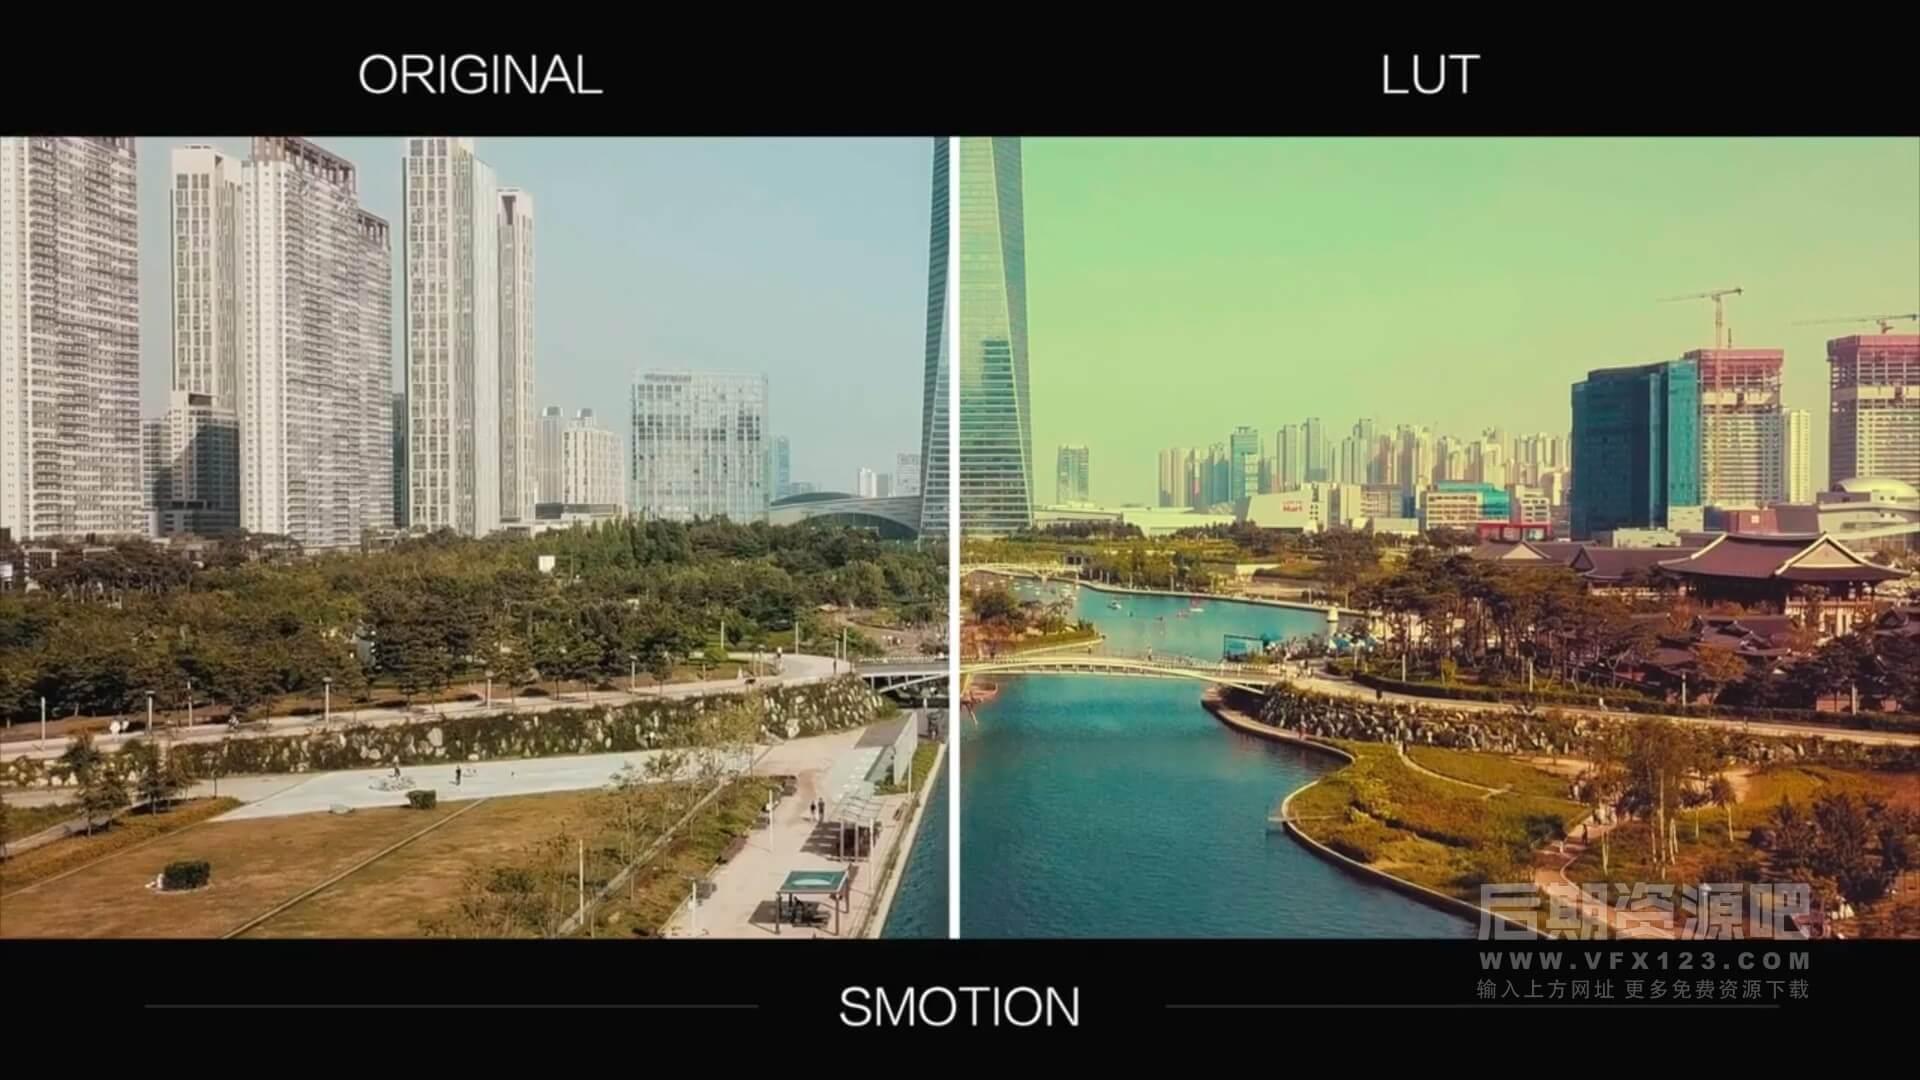 LUTs预设 12组经典影片颜色分级调色预设 Vintage LUTs